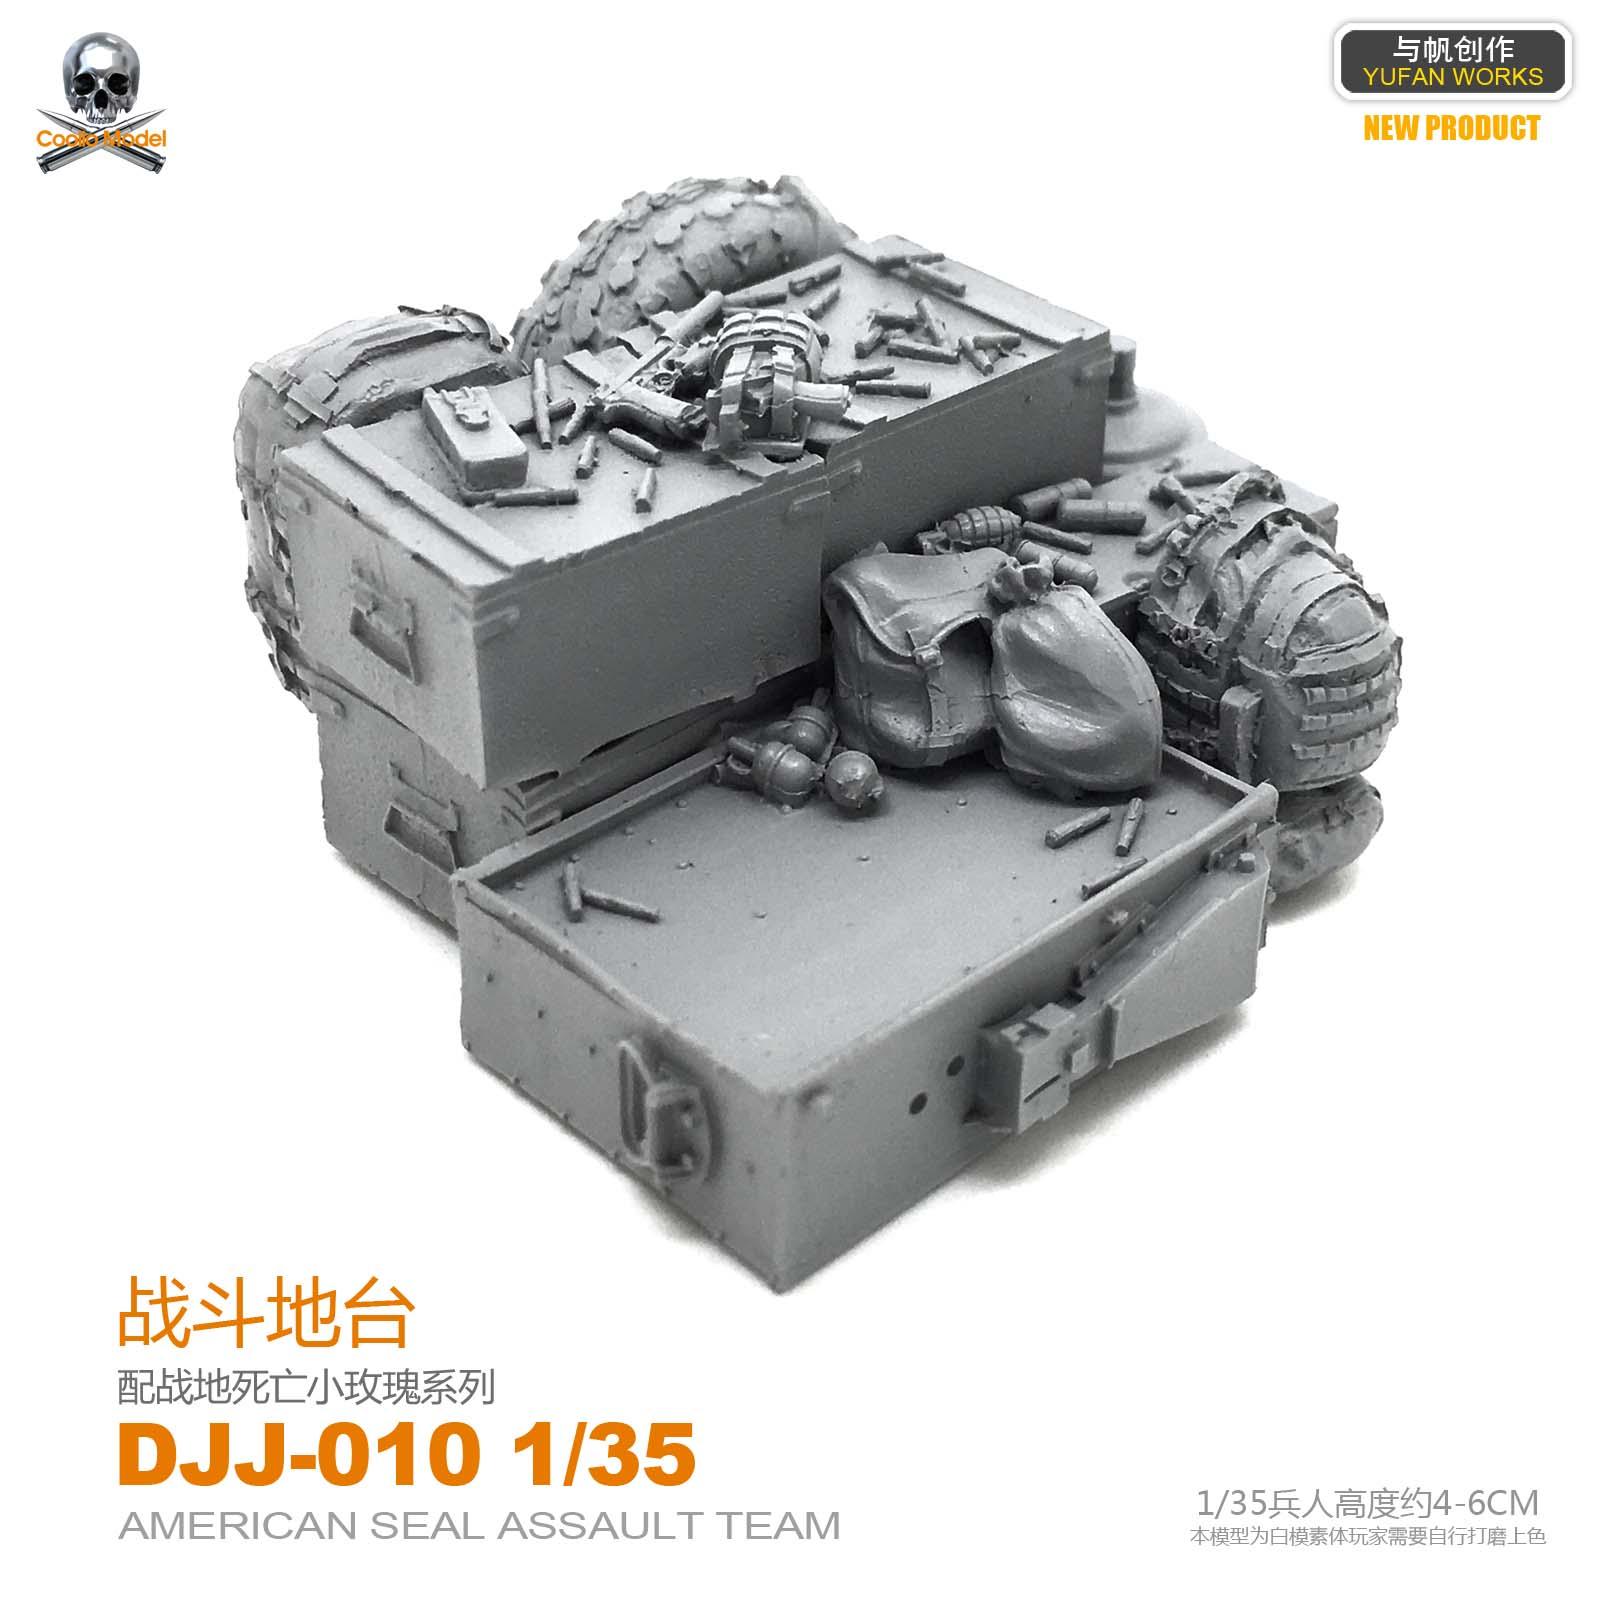 1-35-re-ine-Modern-Asker-Platformu-Modeli-Oyuncak-Djj-10.jpg